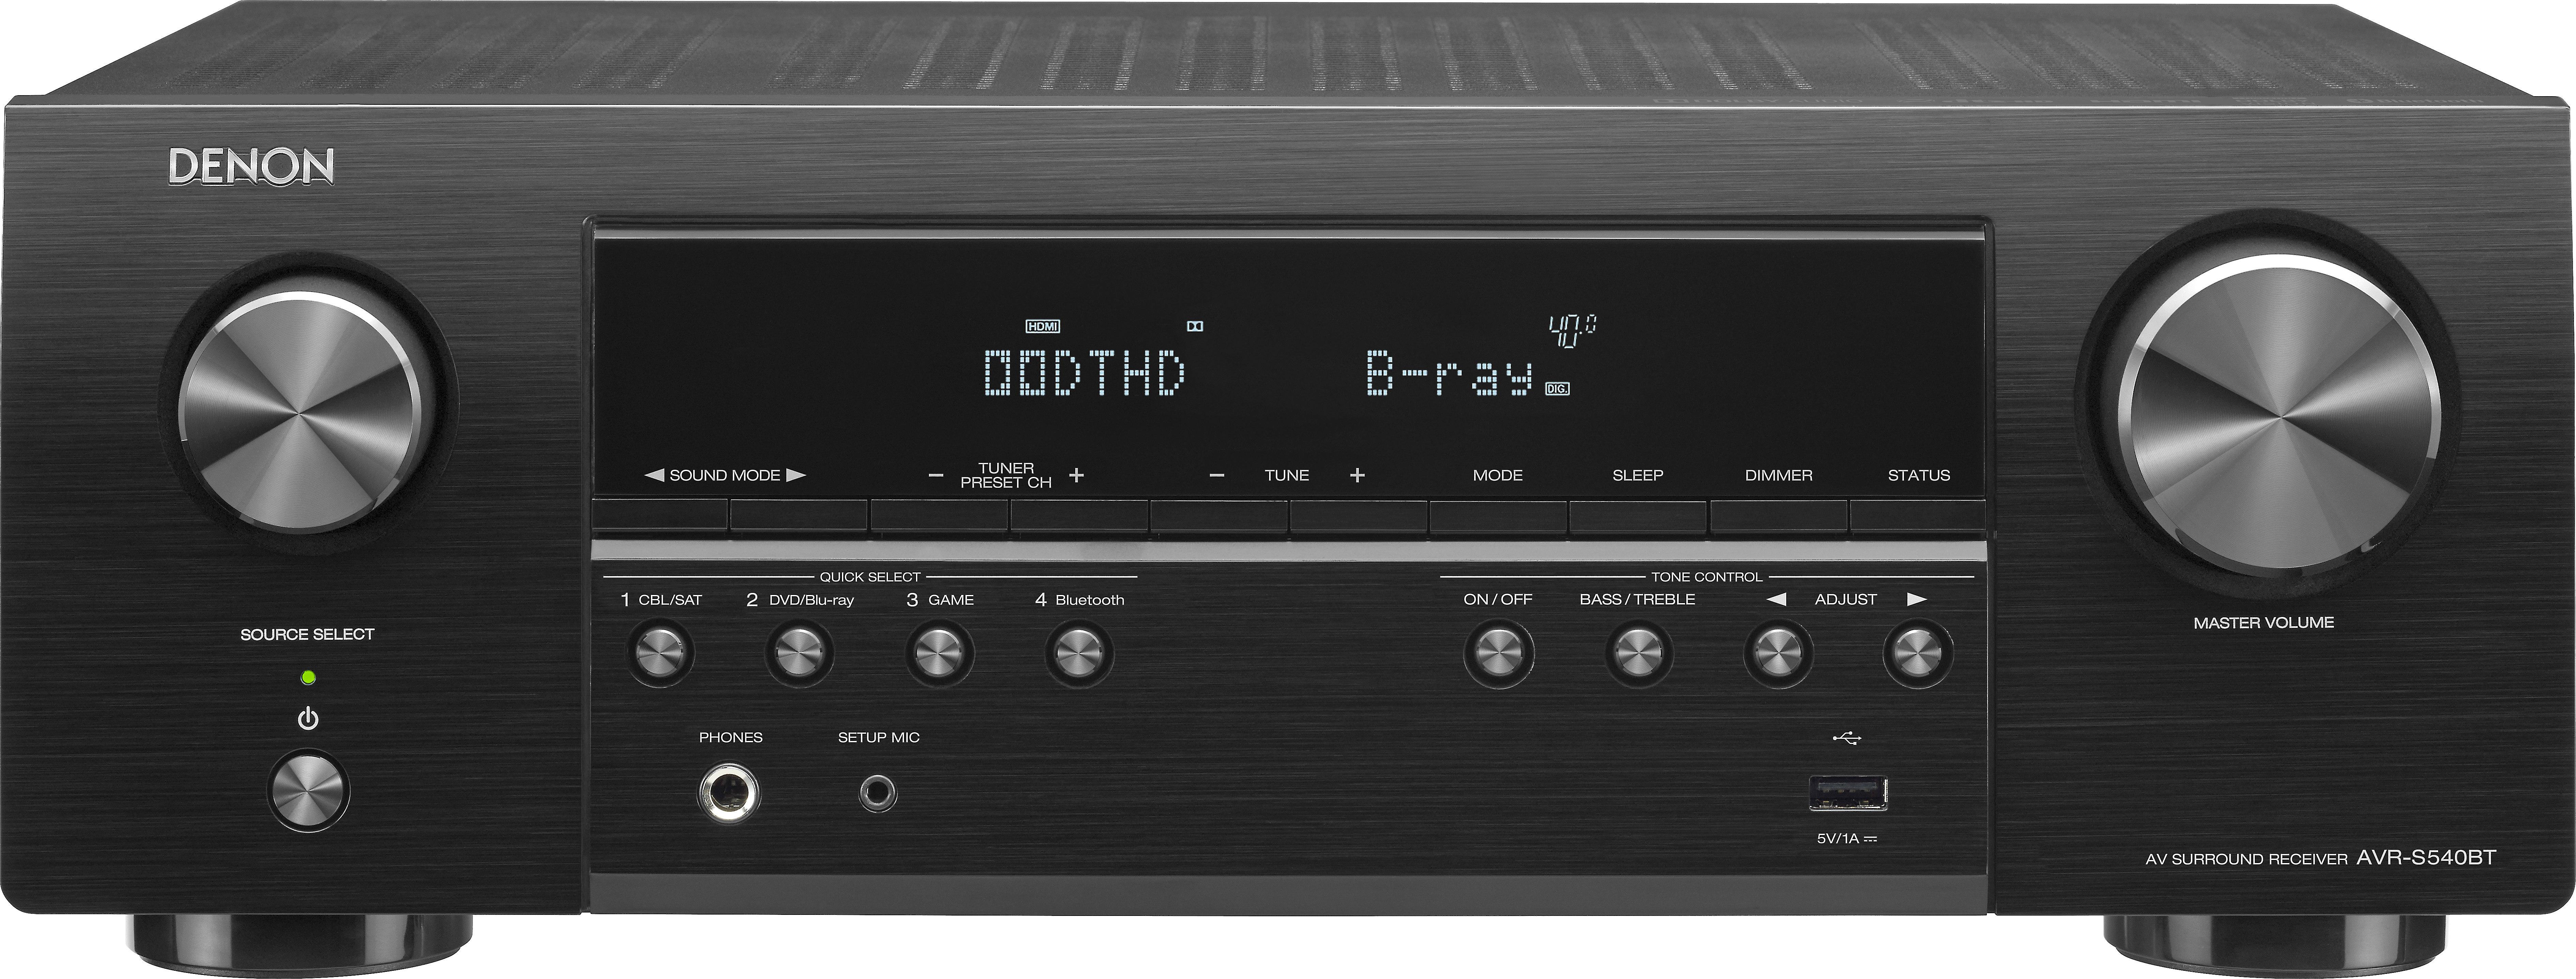 Denon AVR-S540BT